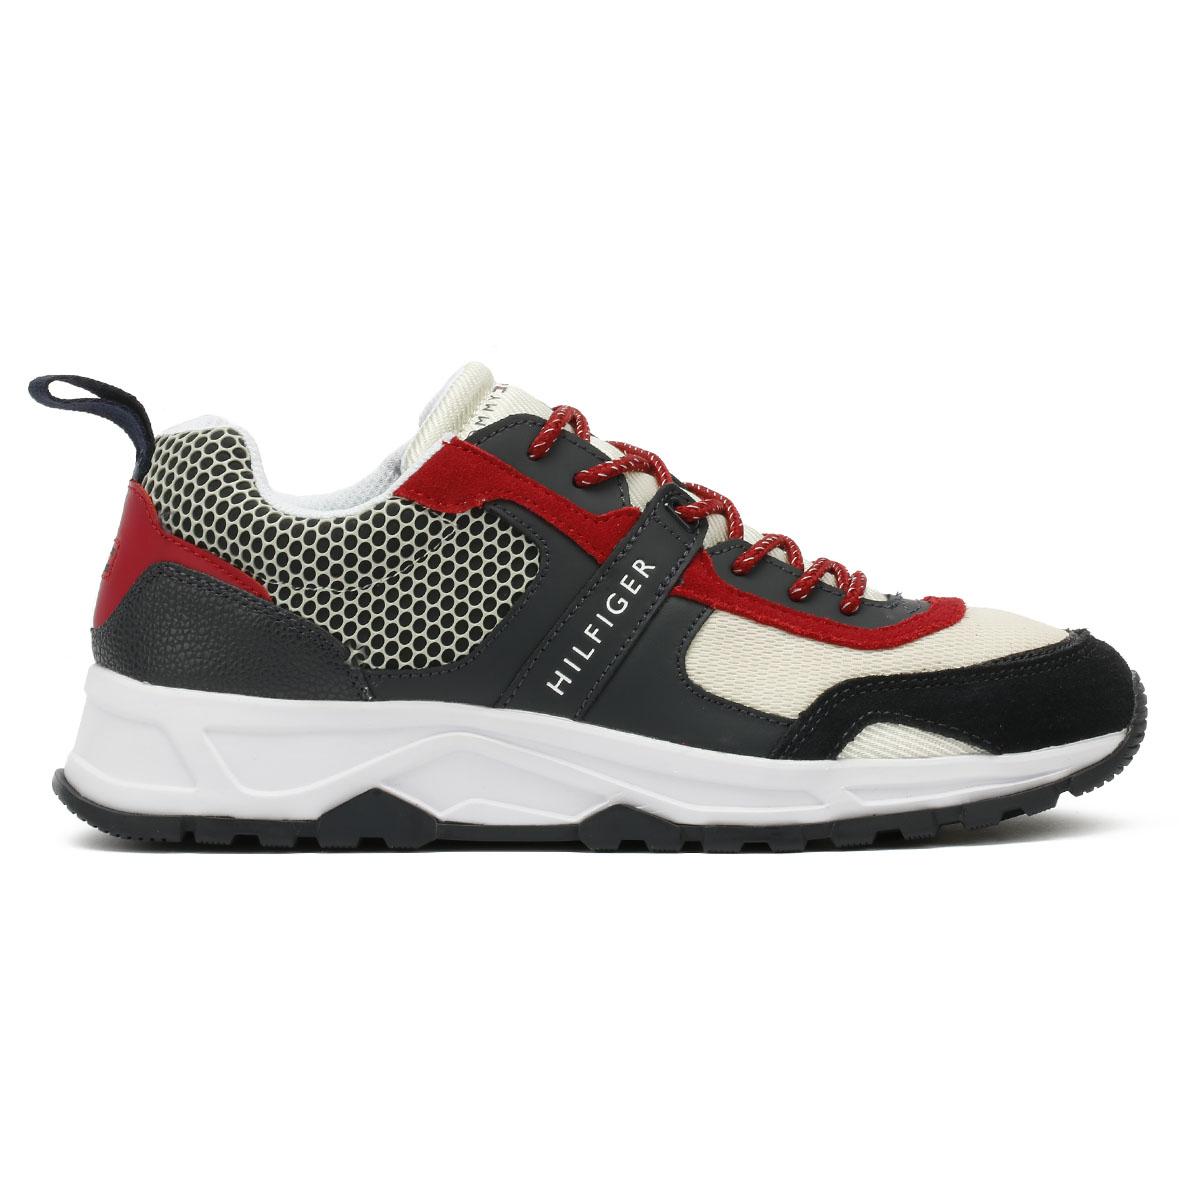 Tommy Hilfiger Runner Entrenadores RWB sport con cordones para hombre sport RWB casual zapatos para caminar f93e58